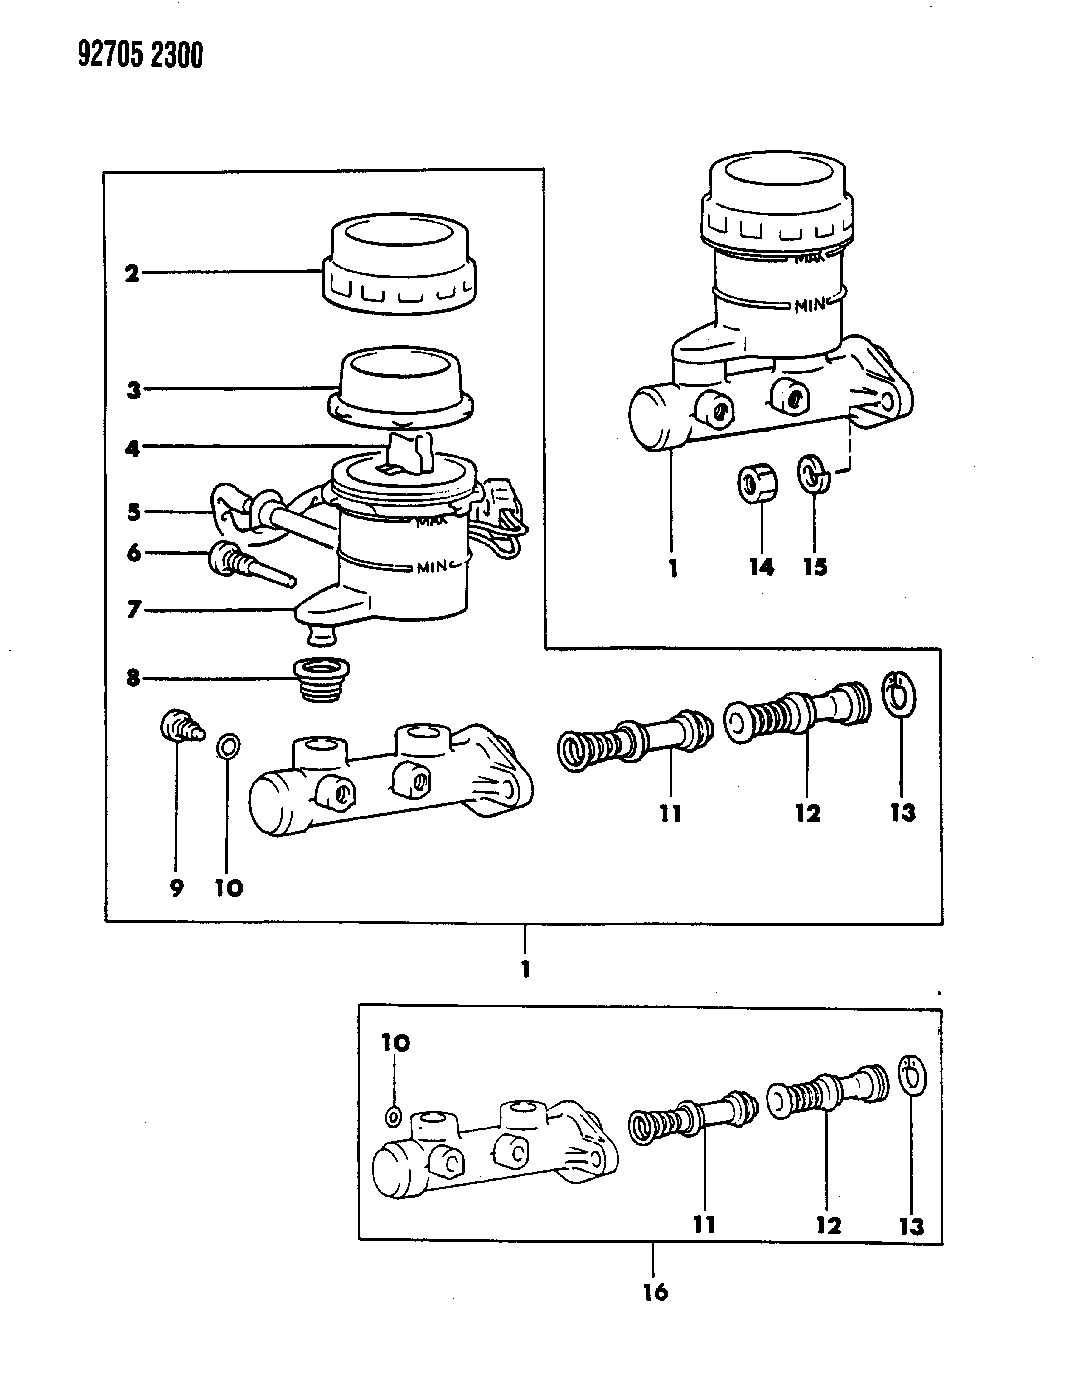 Mb316236